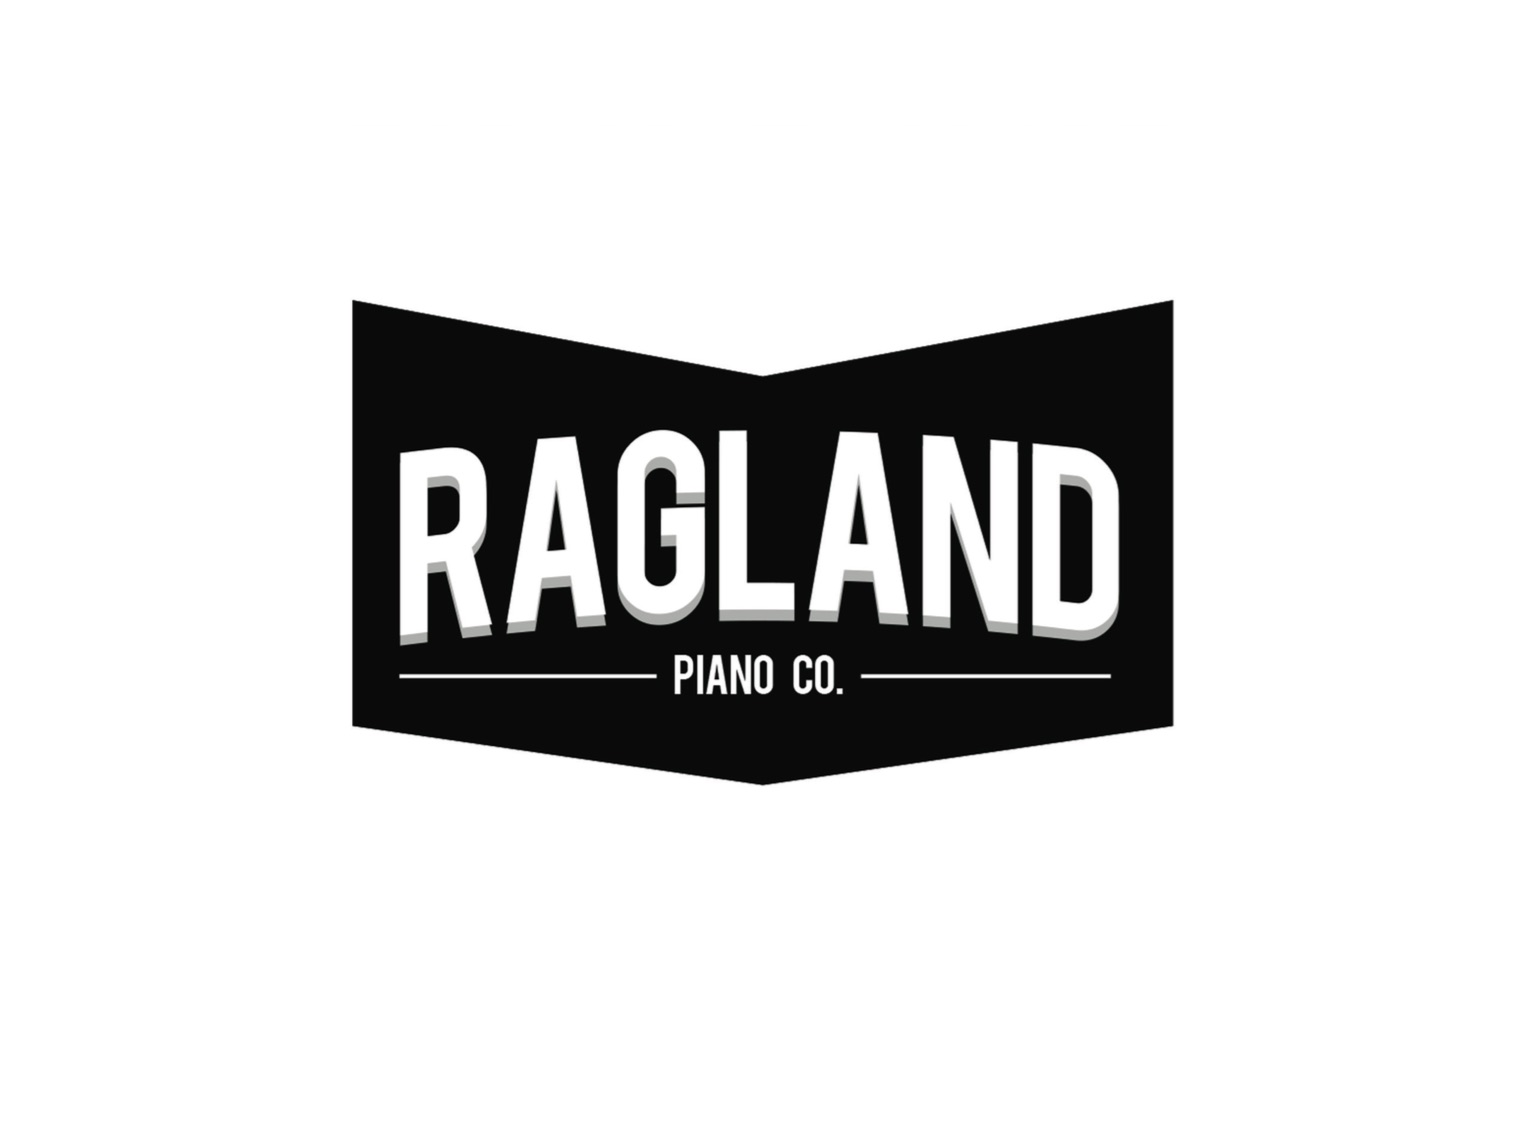 Ragland Piano Company